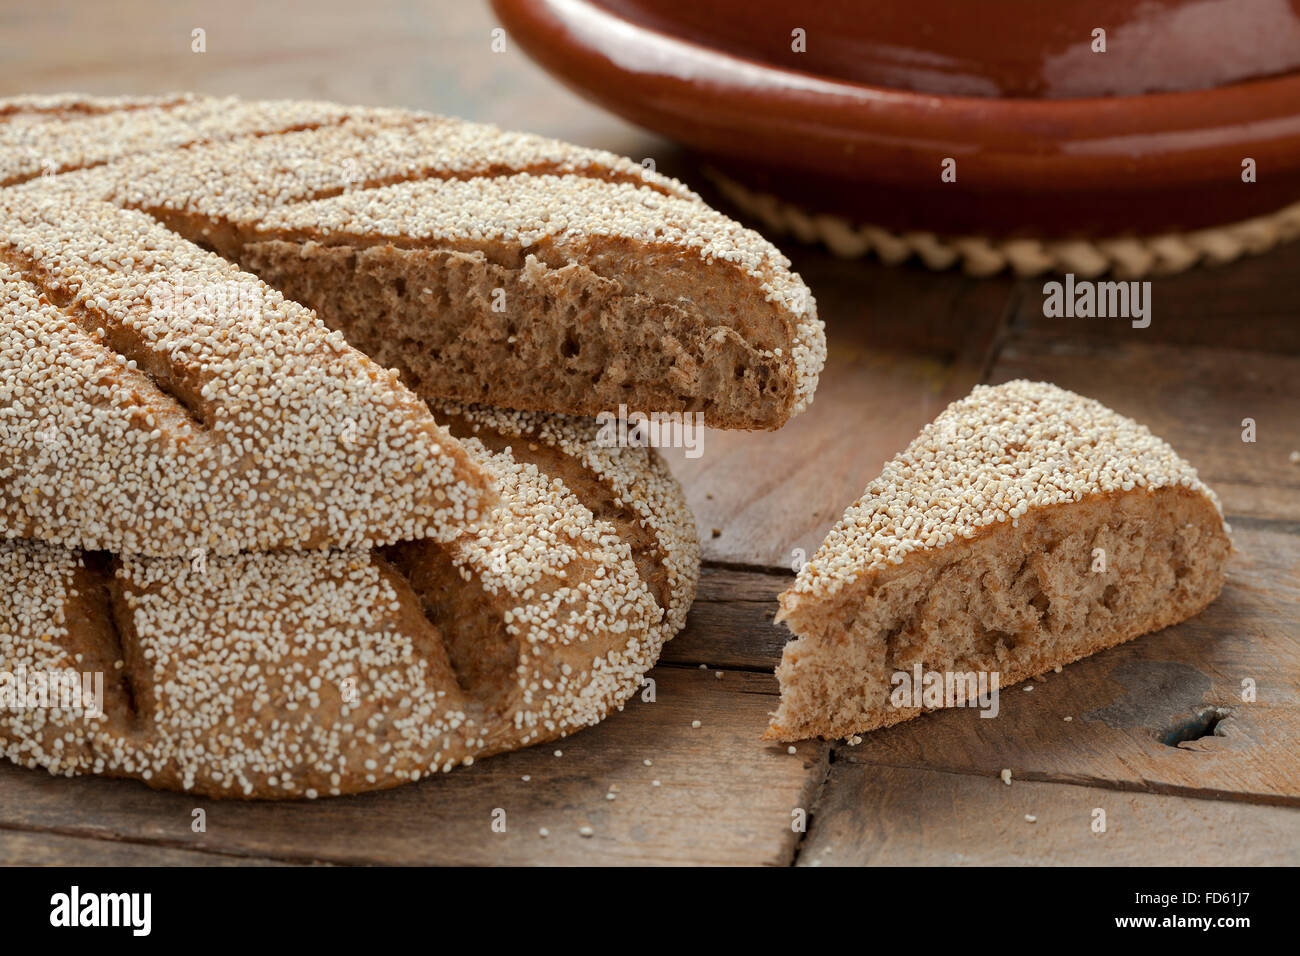 Frisch gebackene marokkanische Grieß Brot Stockbild